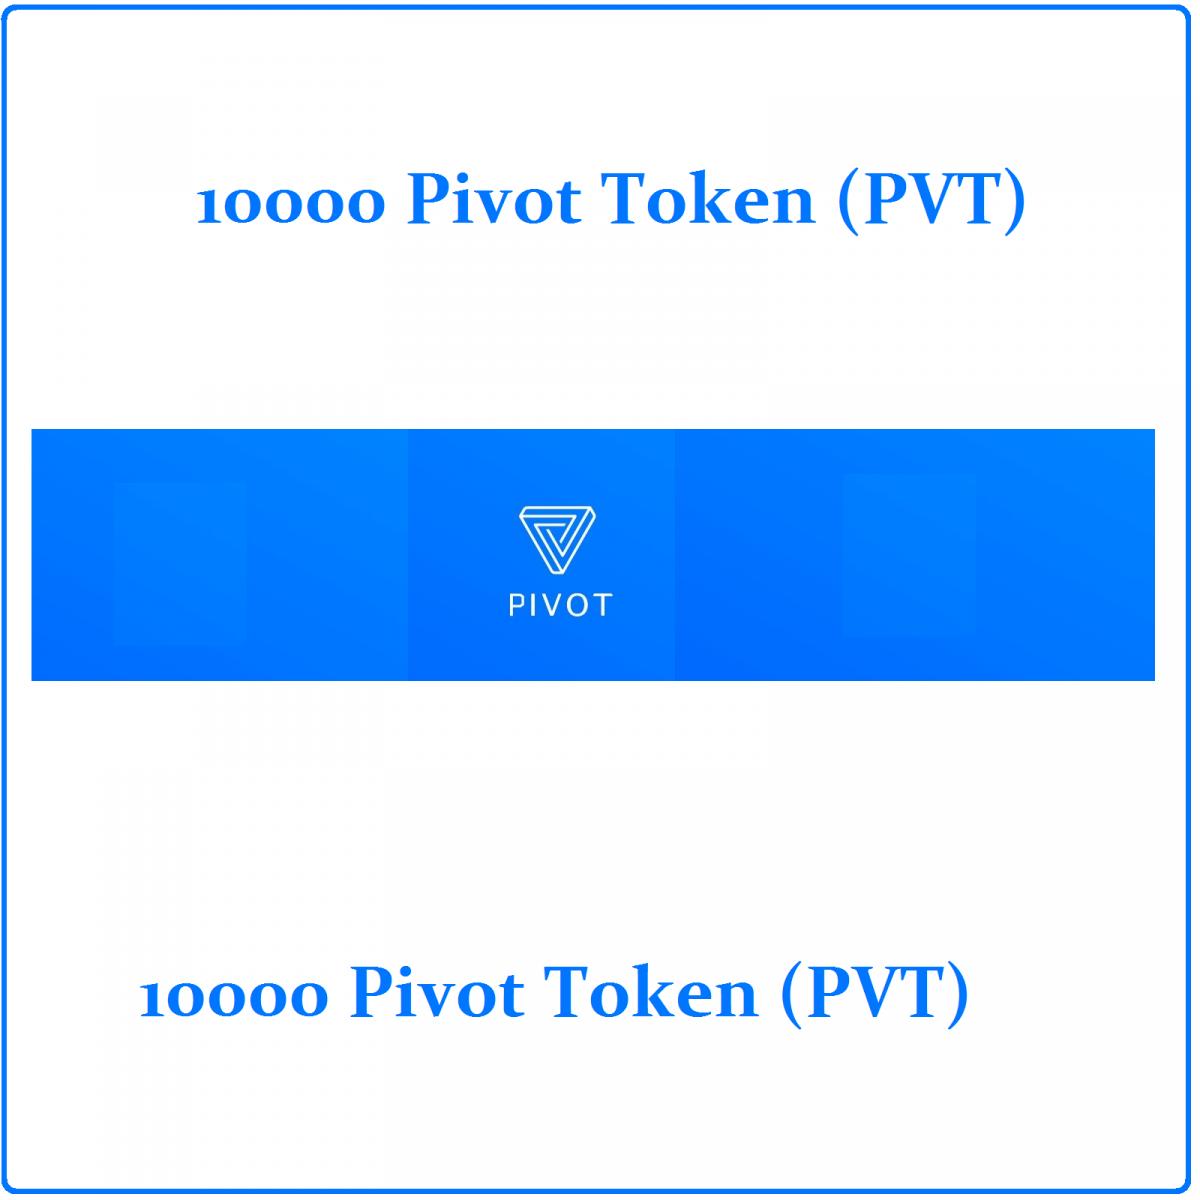 10000 Pivot token (PVT) Mining Contract